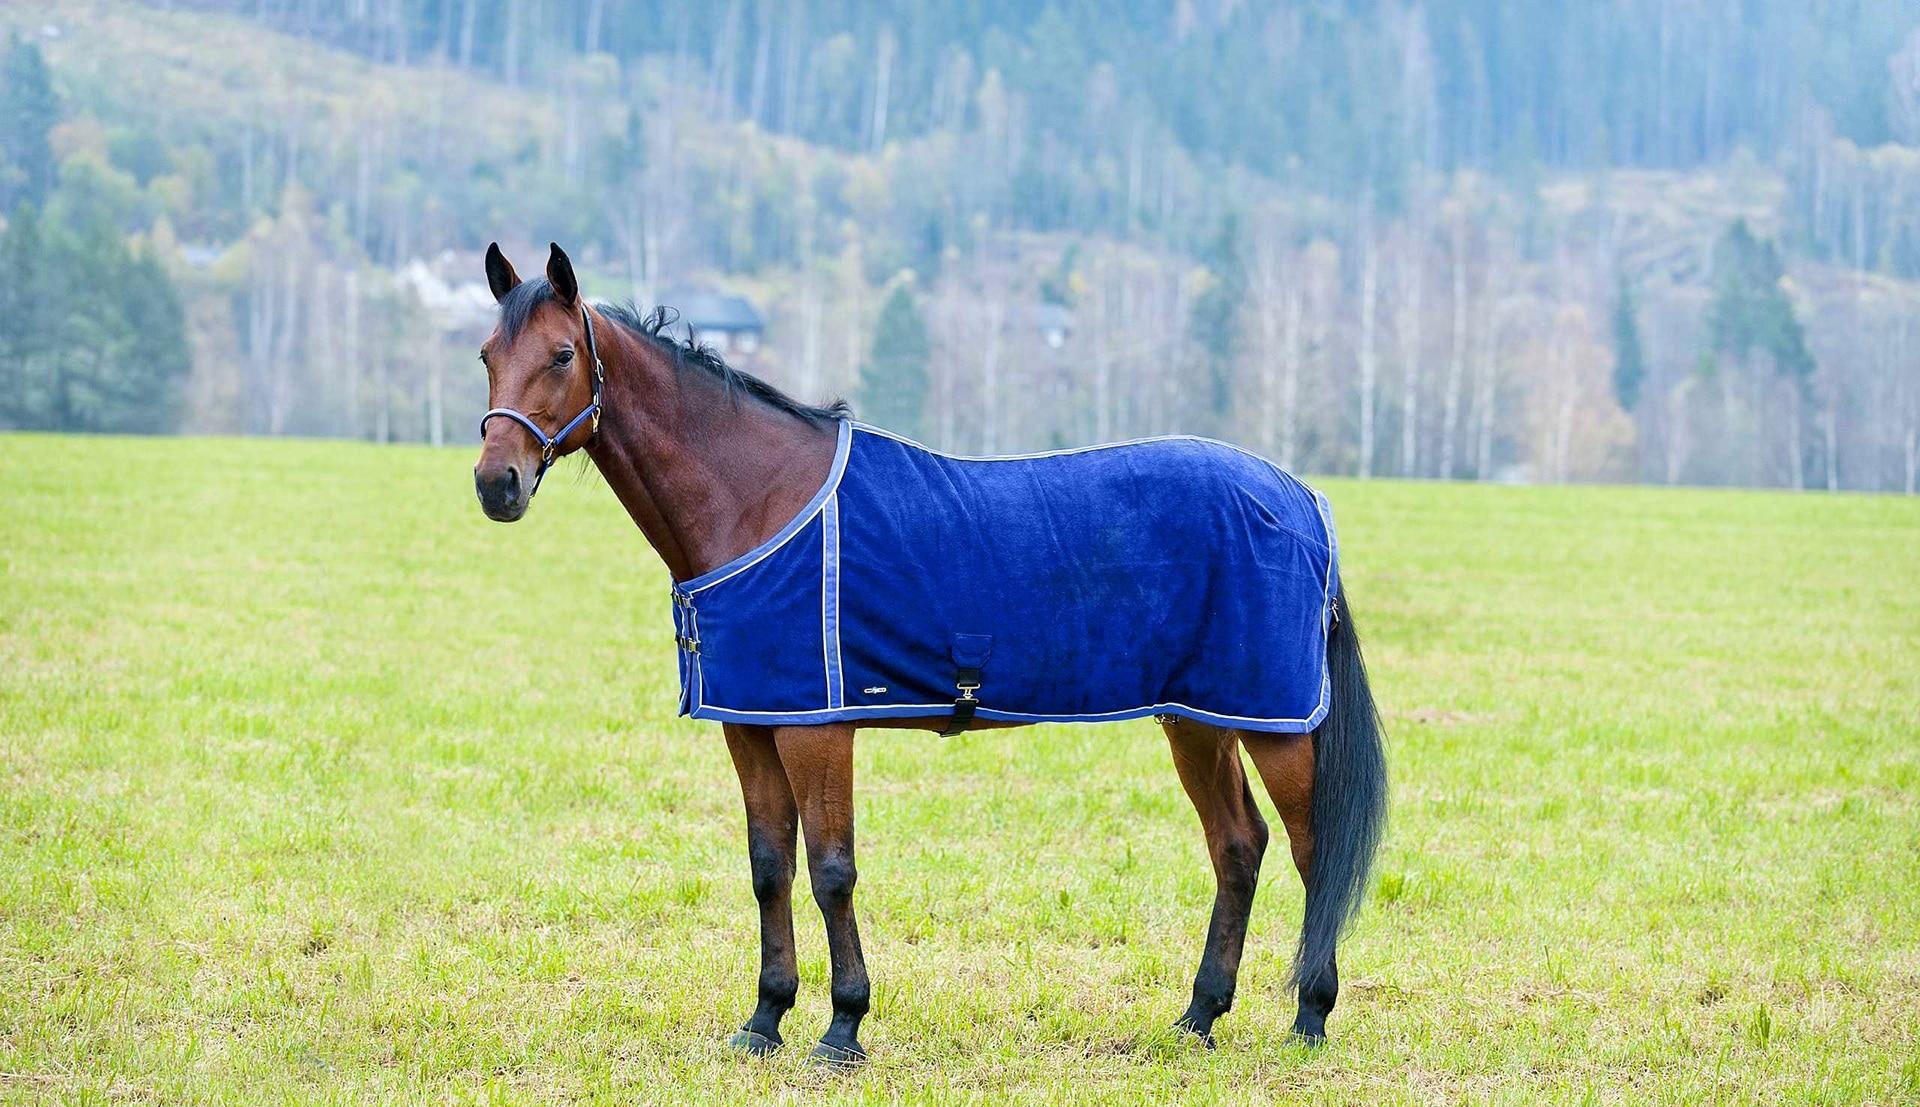 78, Orange TGW RIDING Comfitec Essential Standard Neck Lite Horse Turnout Sheet 1200D Waterproof and Breathable Horse Rain Sheet